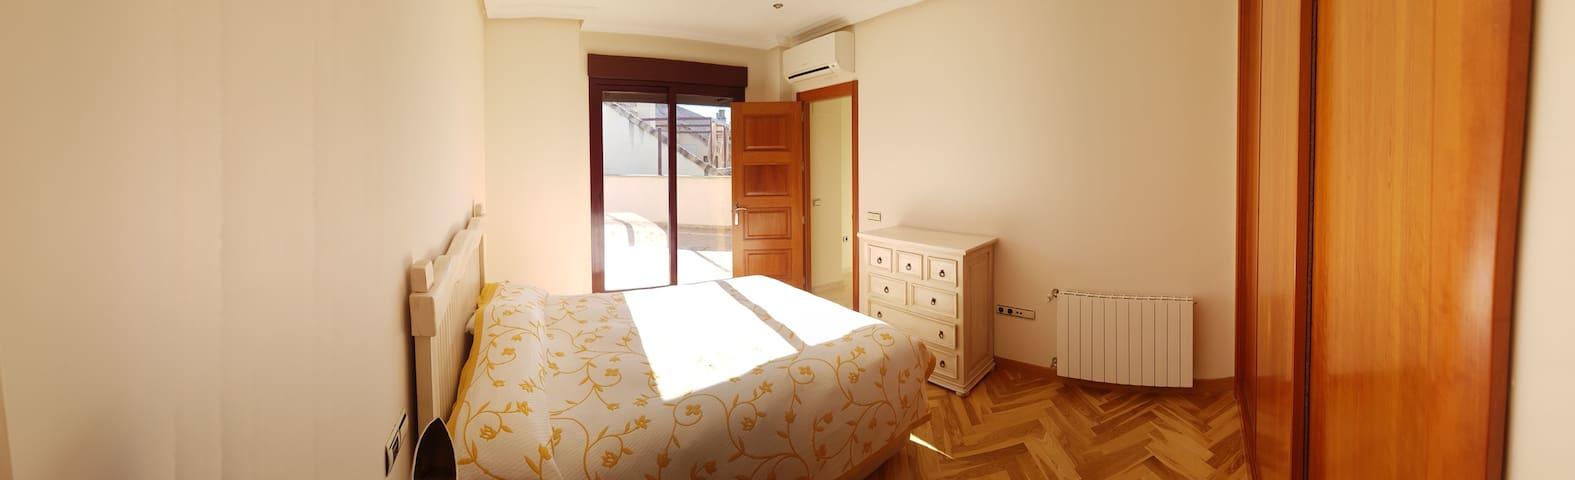 Un amplio hogar de lujo para disfrutar. - Badajoz - Maison